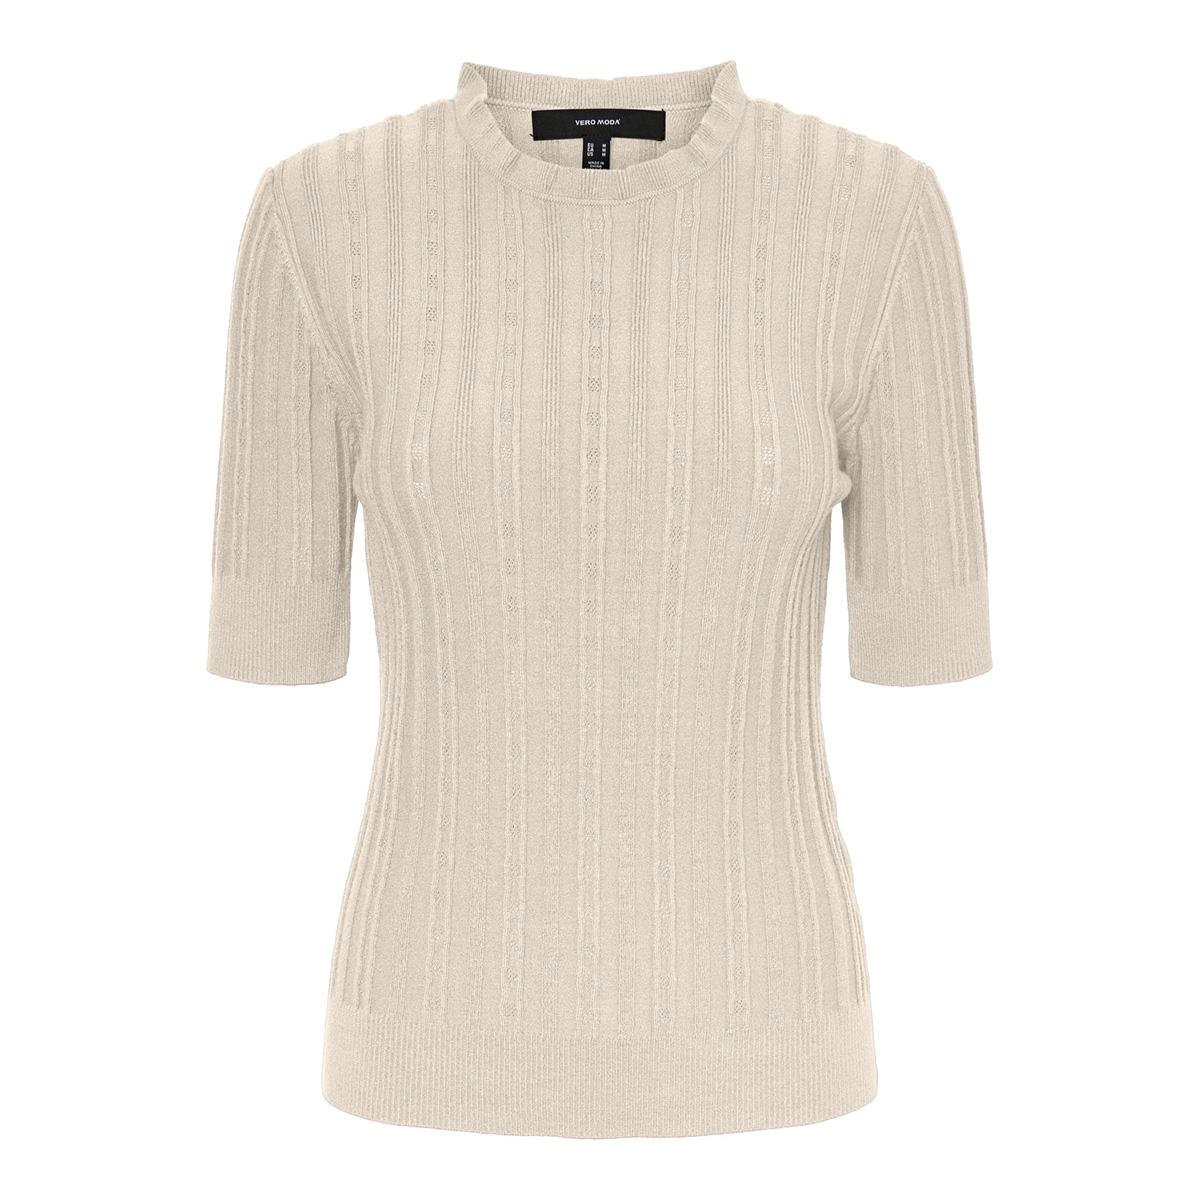 vmvitawave 2/4 highneck blouse ga 10232495 vero moda trui birch